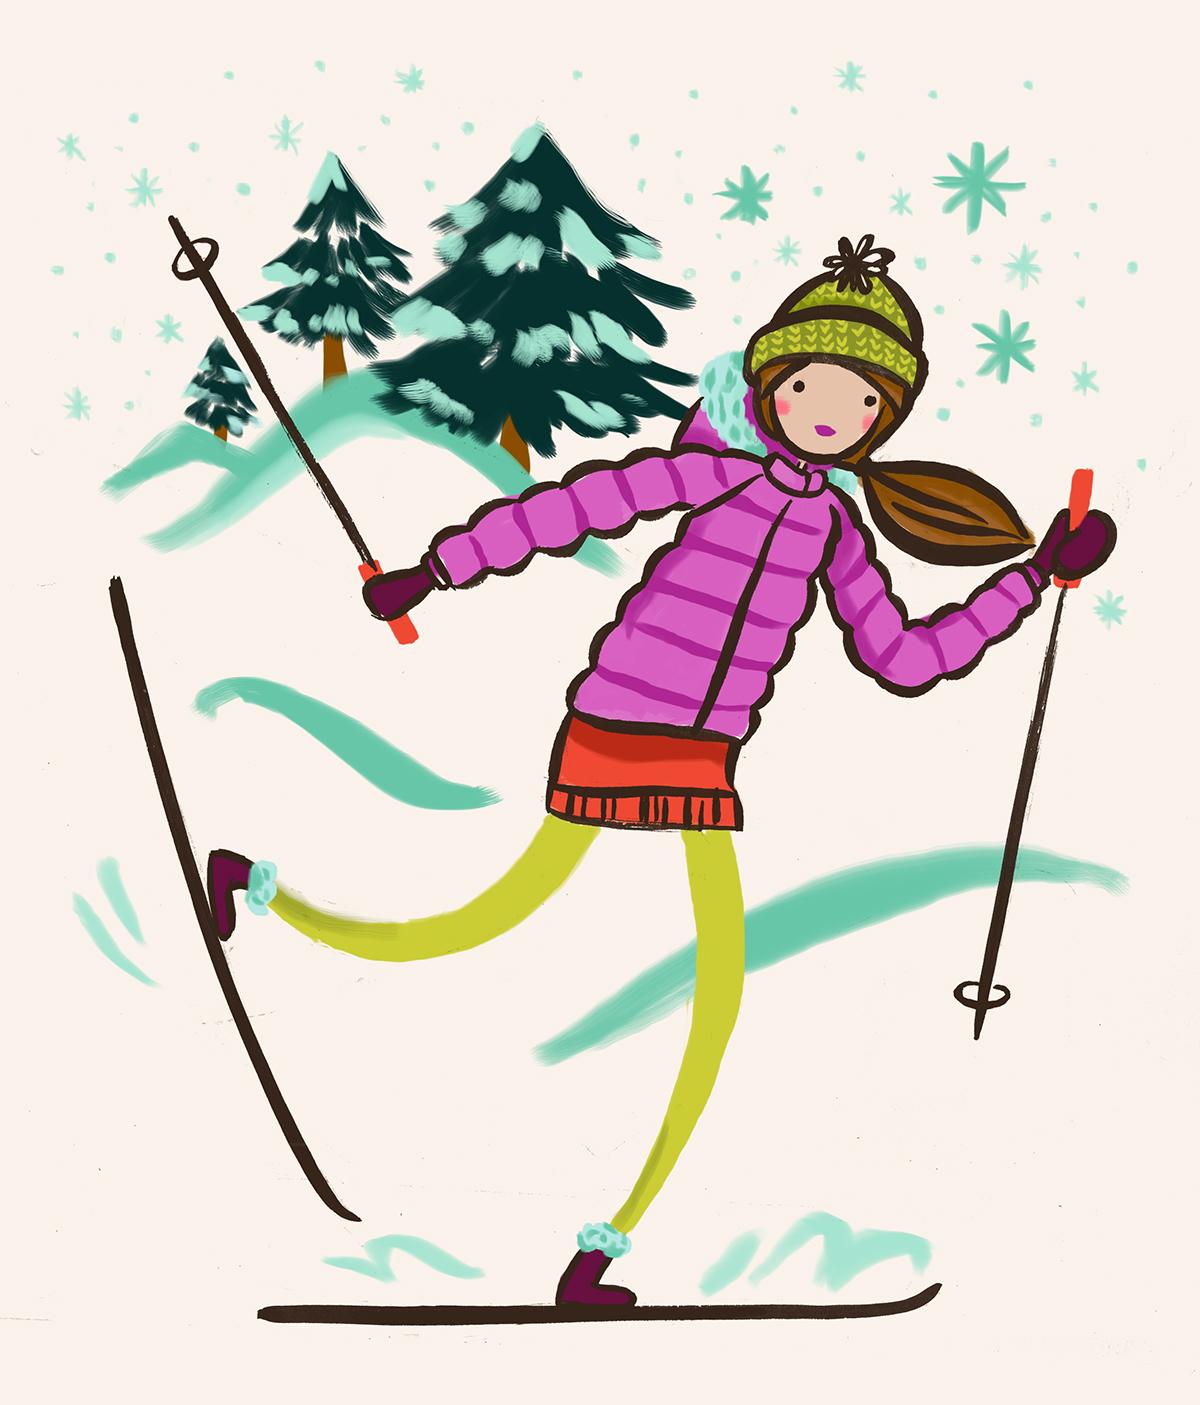 snow-girl.jpg